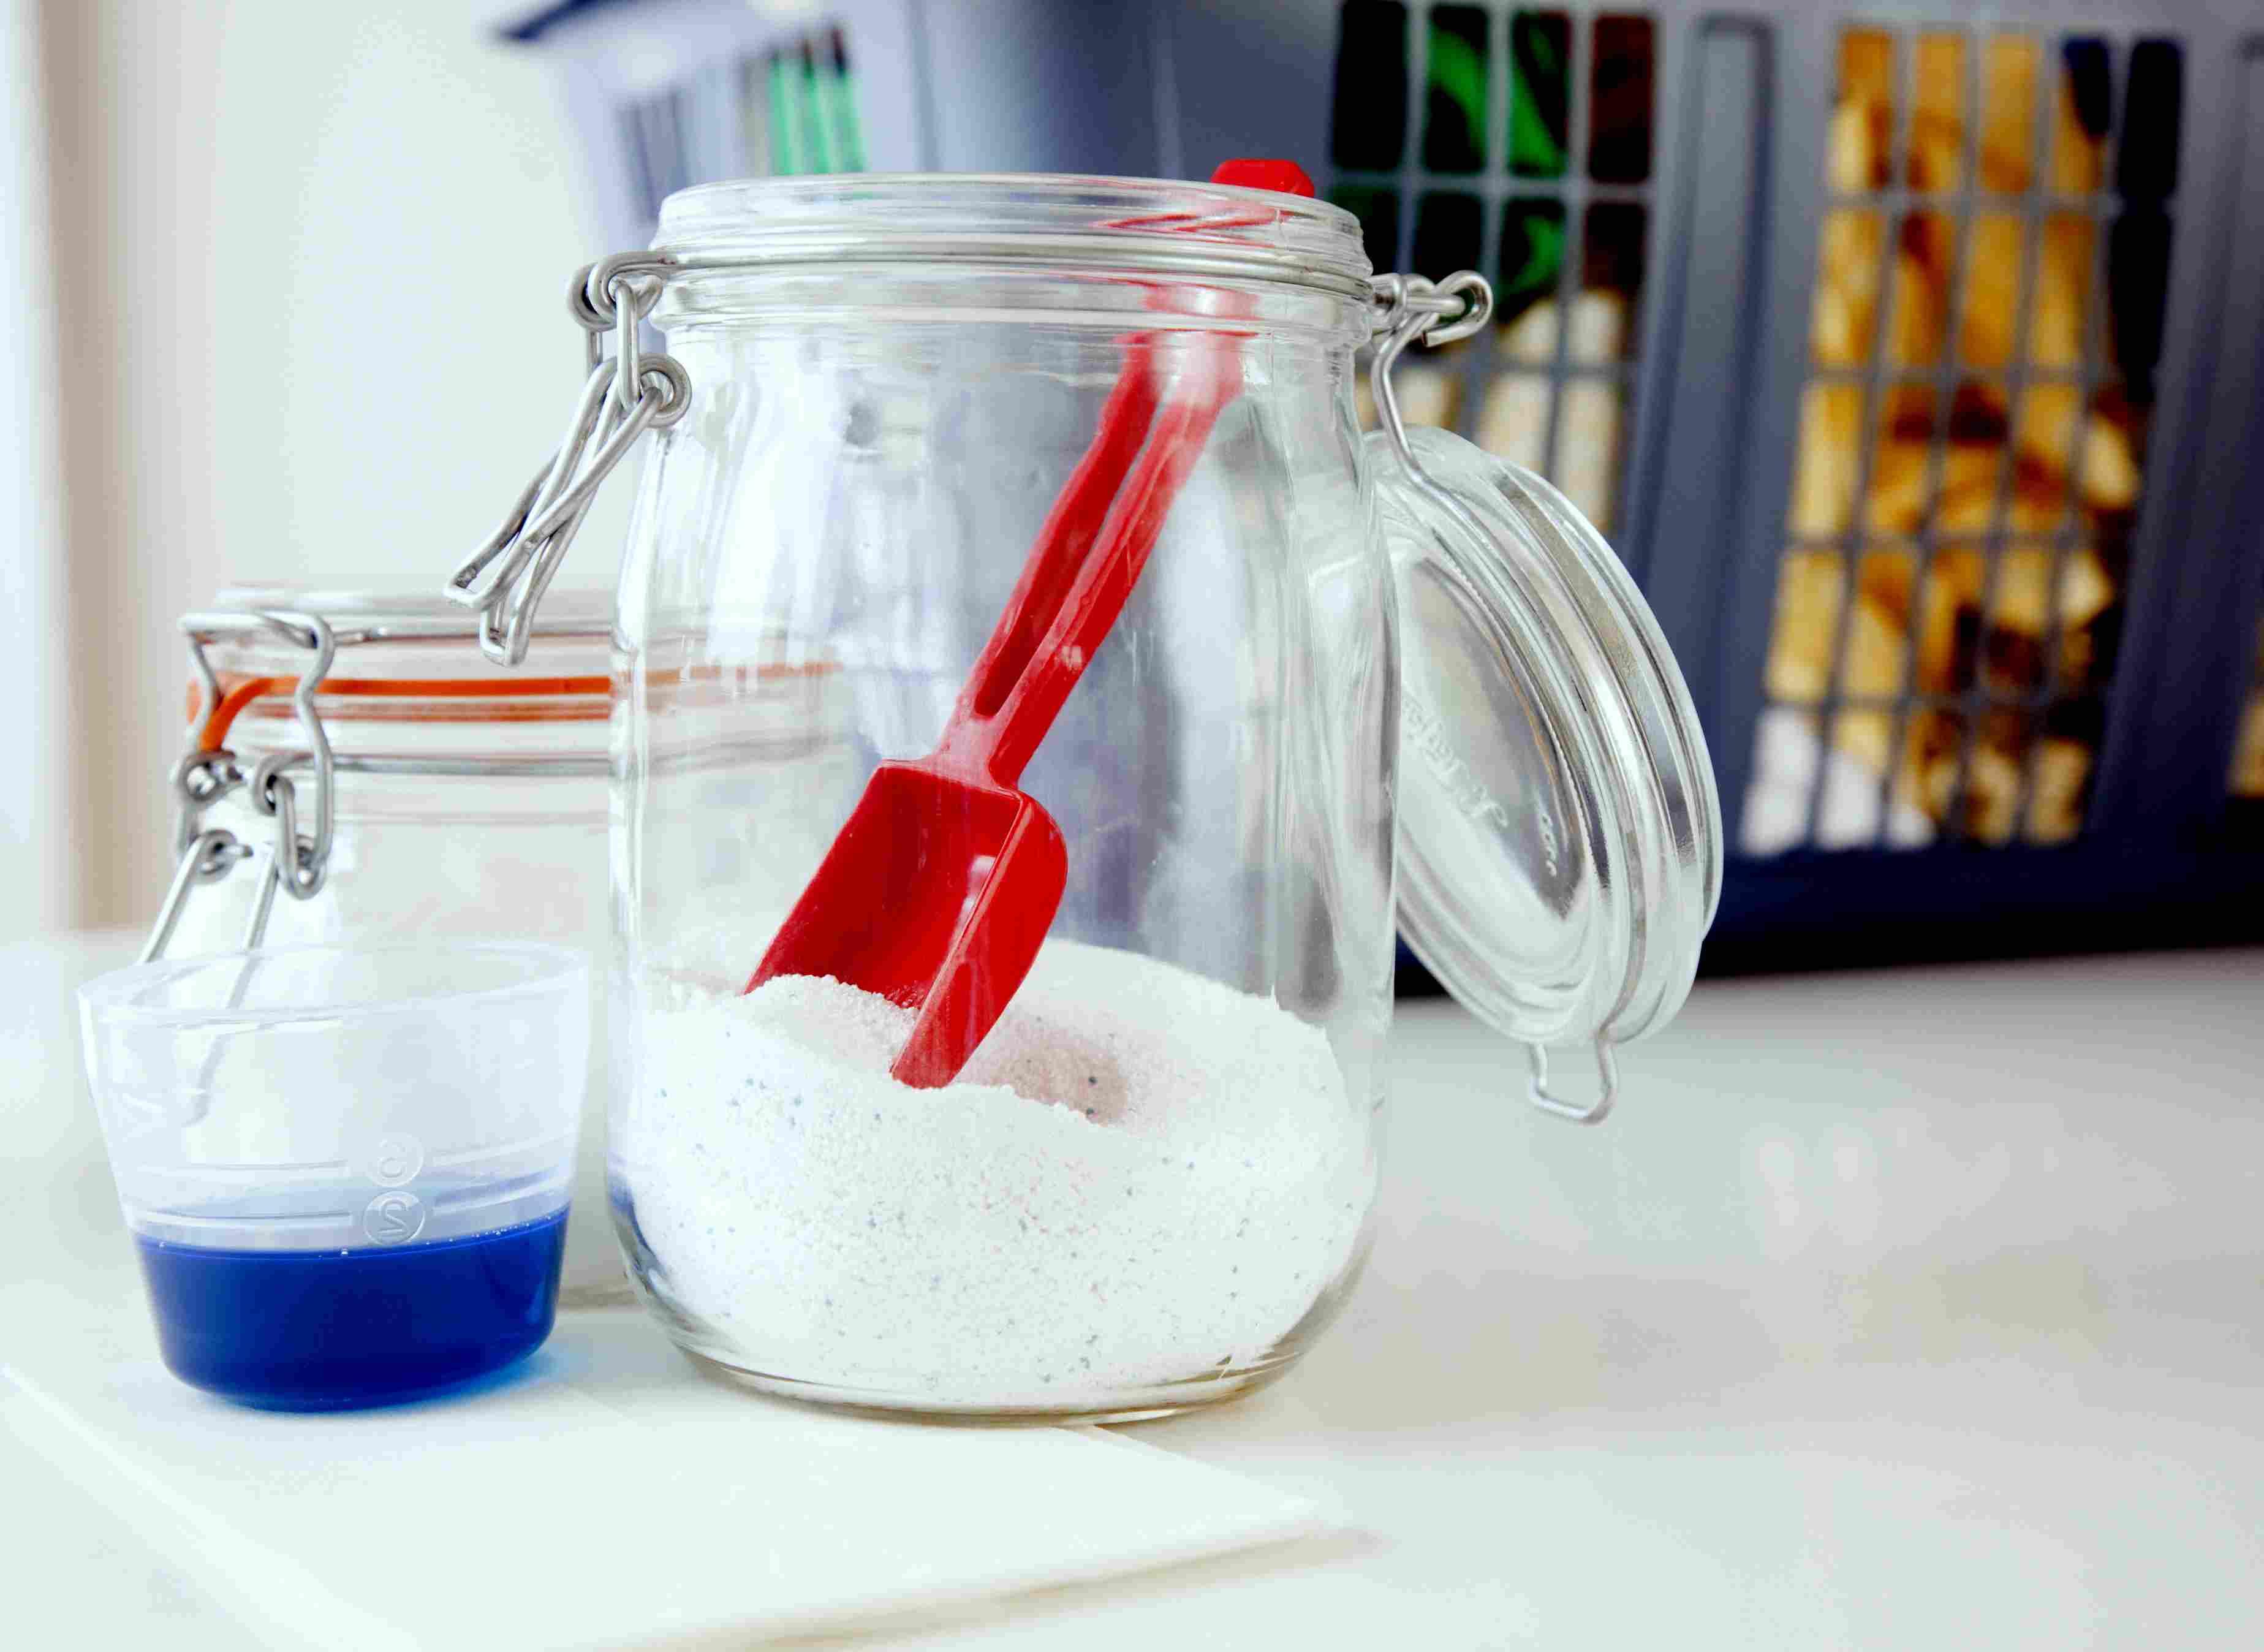 DIY-Laundry-Detergent.jpg